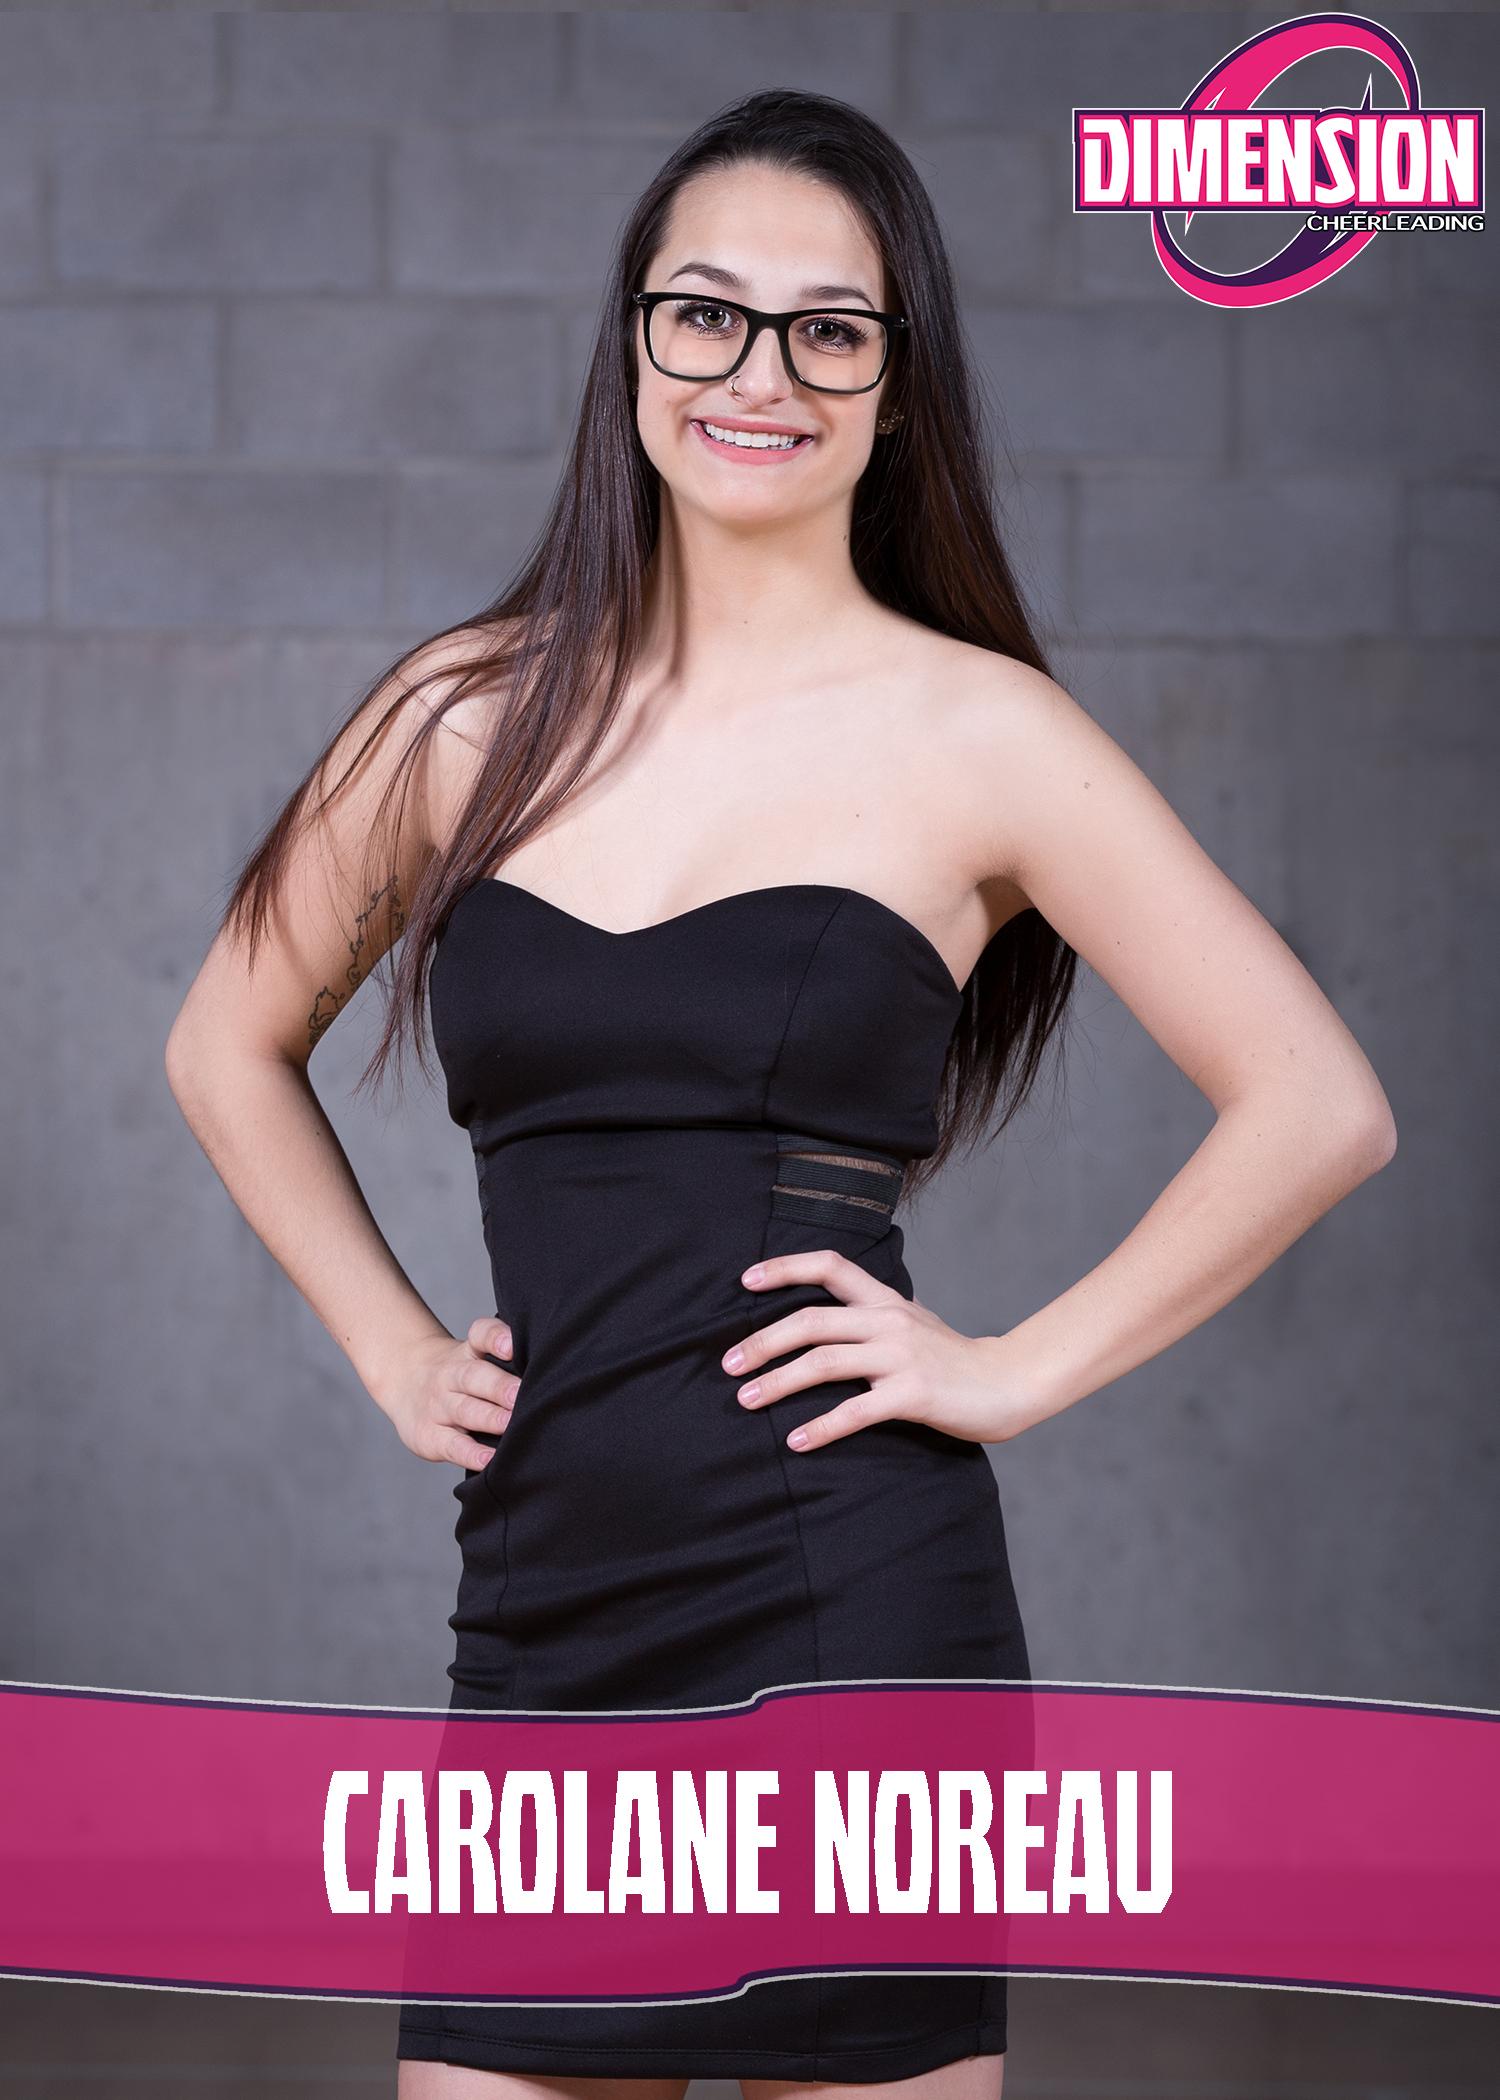 Carolane Noreau